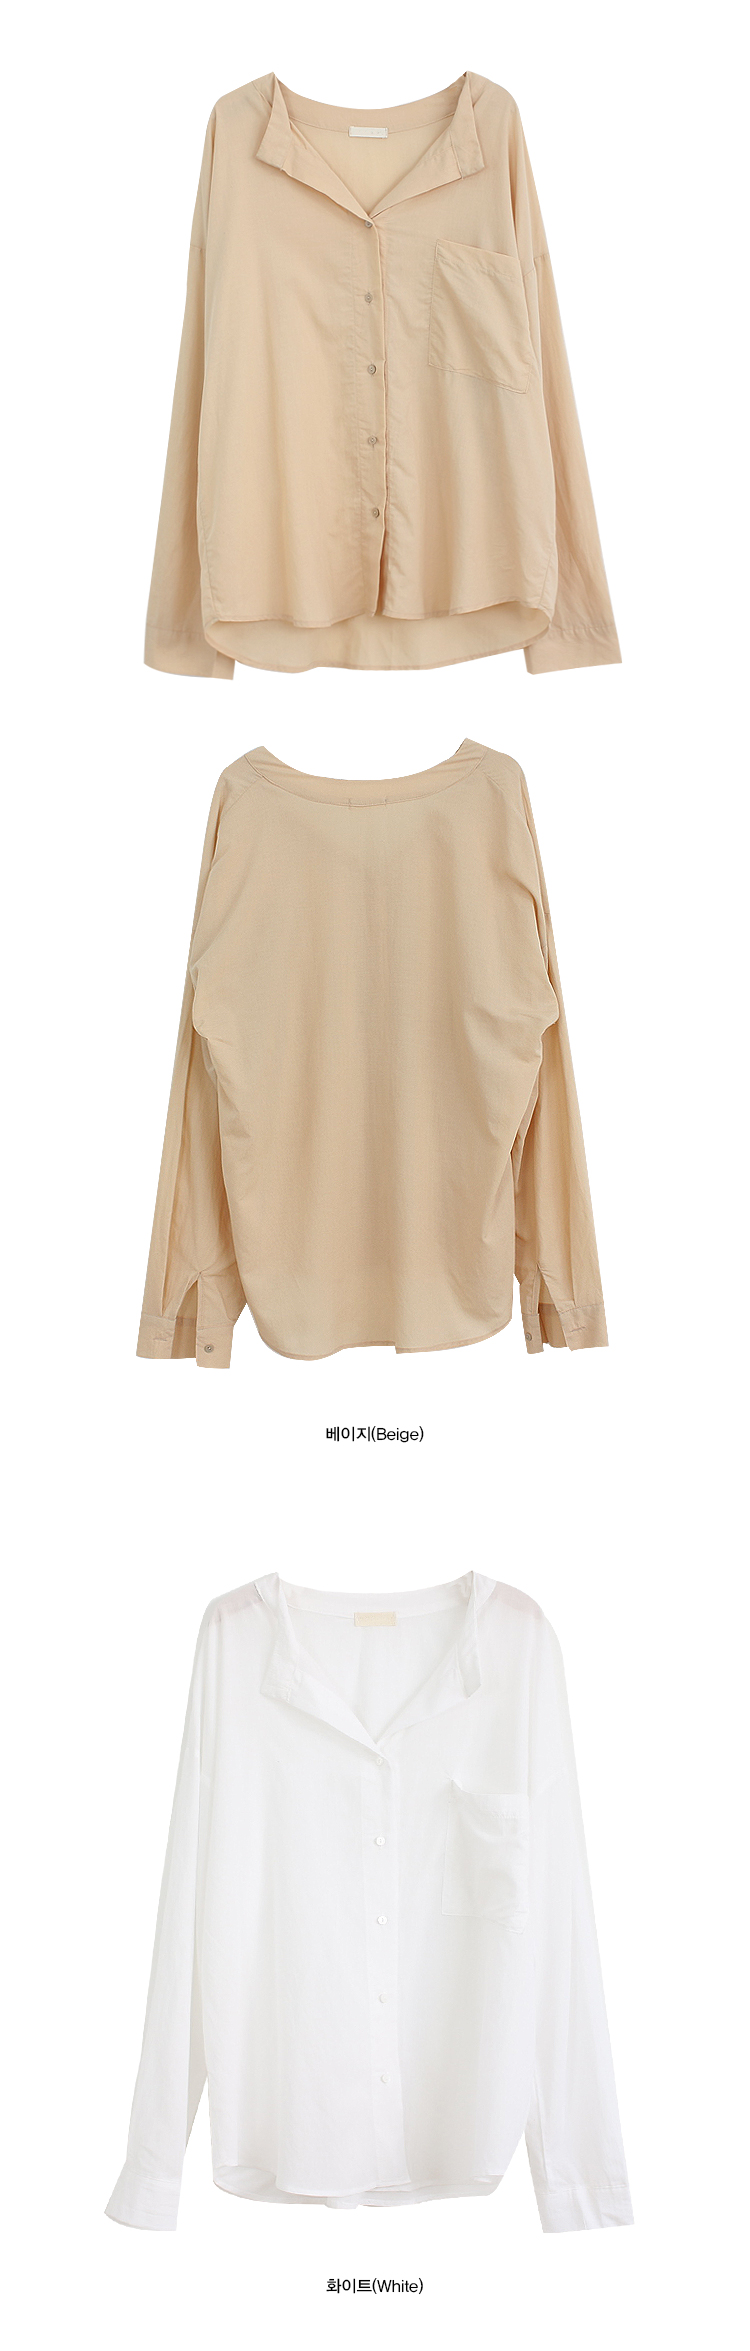 Melting blouse